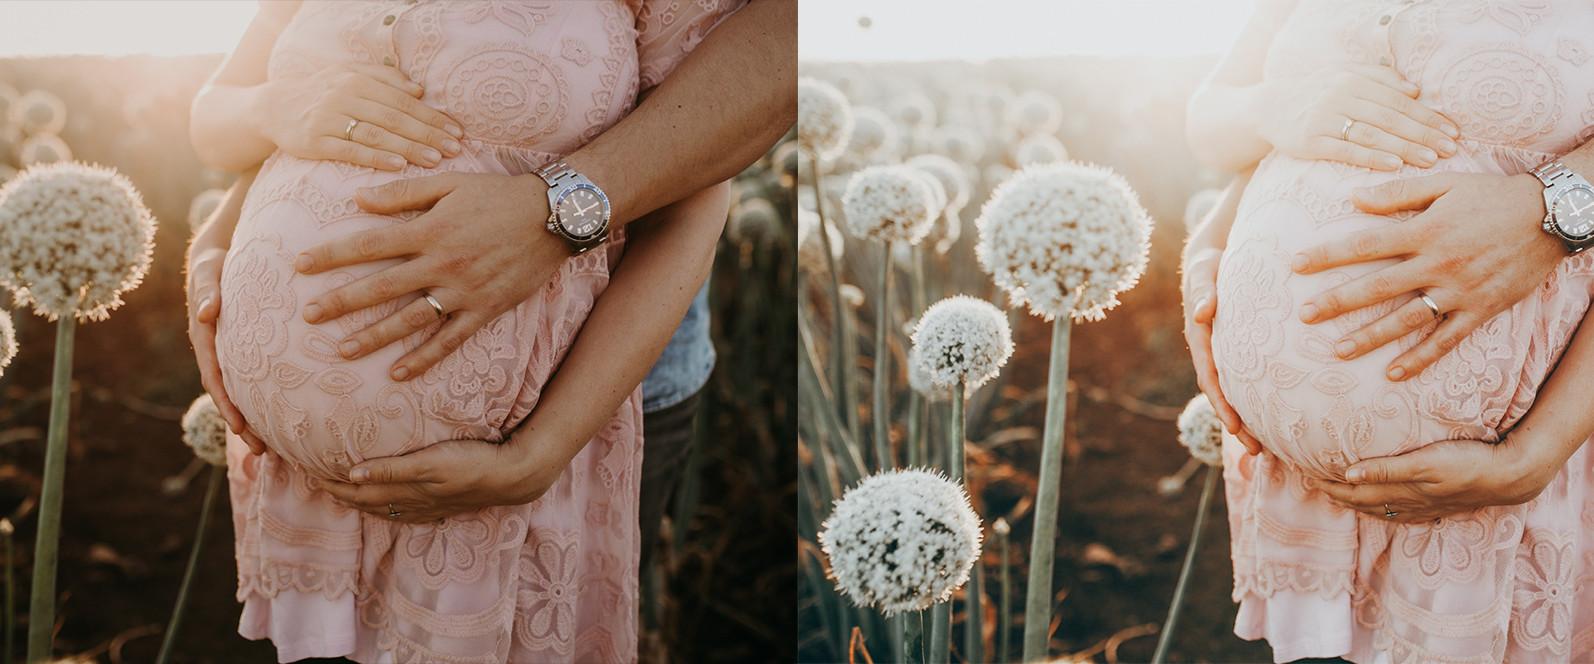 20 x Lightroom Presets, Maternity Presets, Outdoor Presets, Warm Presets, Portrait Presets - 6 Maternity 6 -